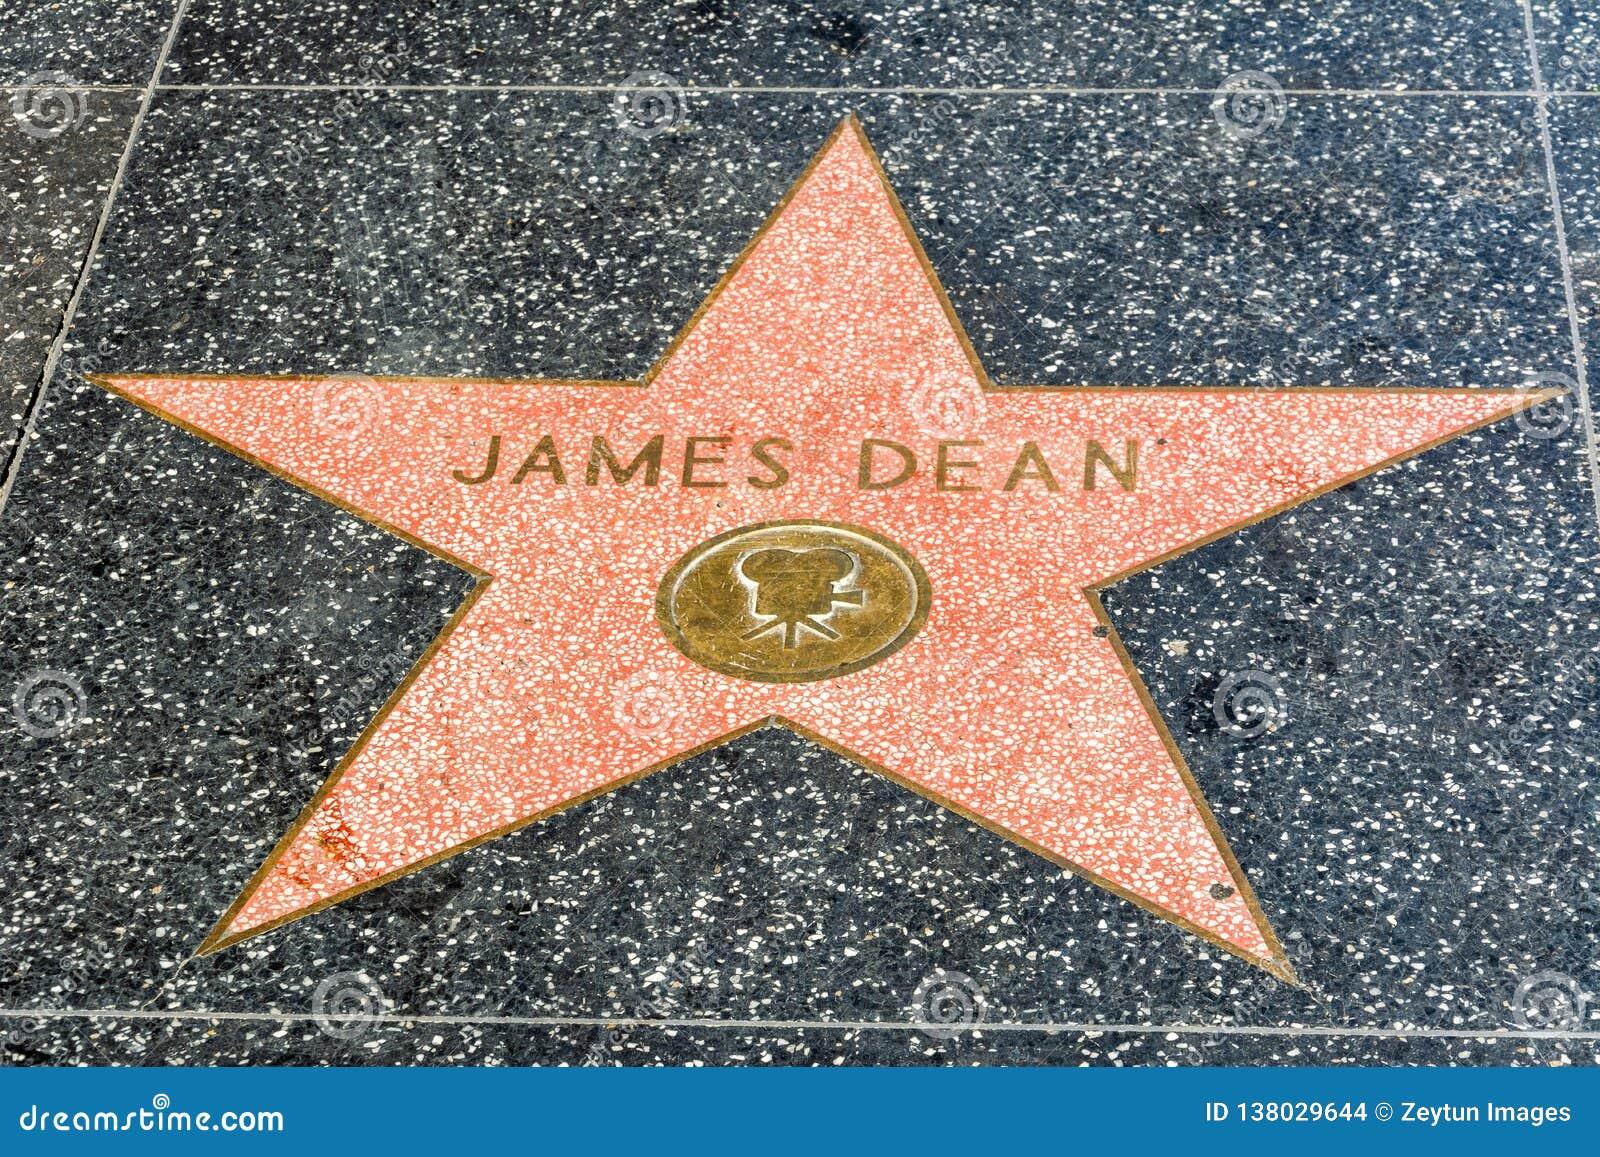 James Dean gwiazda na Hollywood spacerze sława w Los Angeles, CA